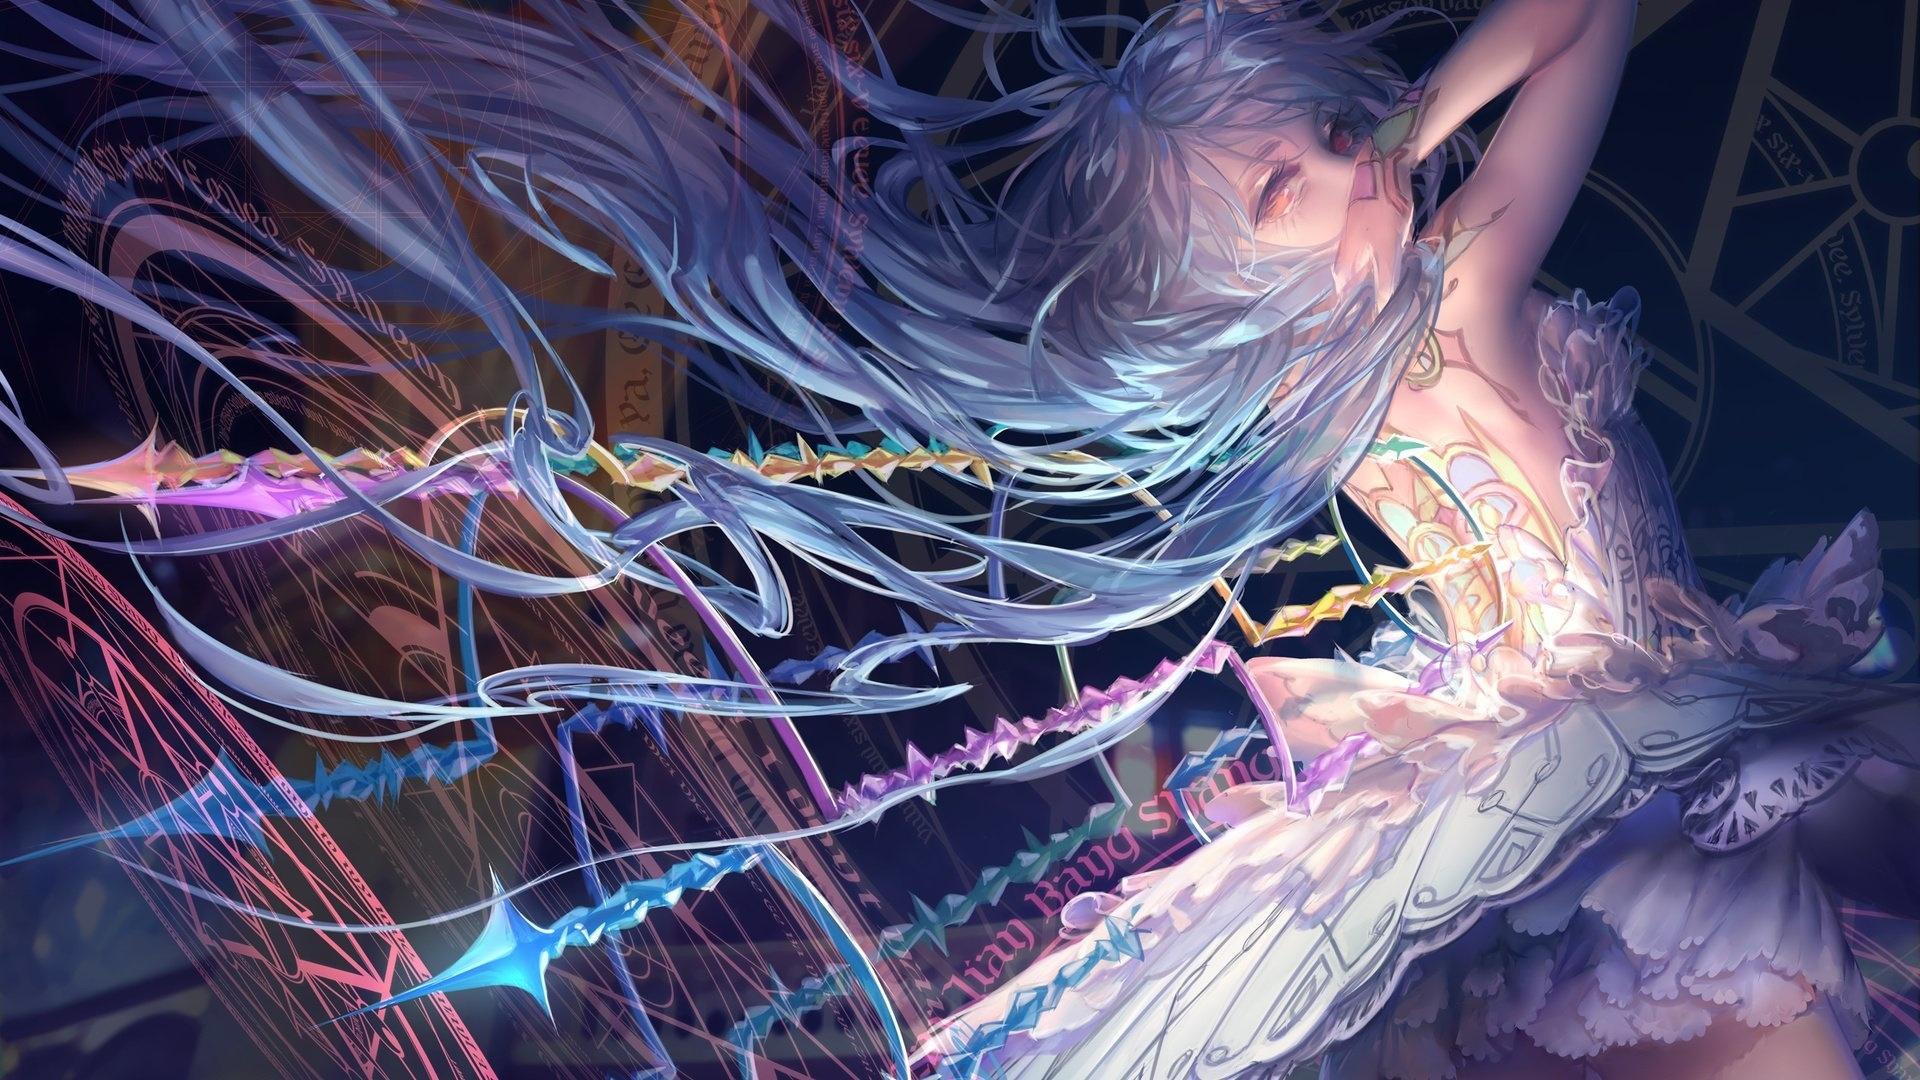 Anime Girl Magician wallpaper for pc